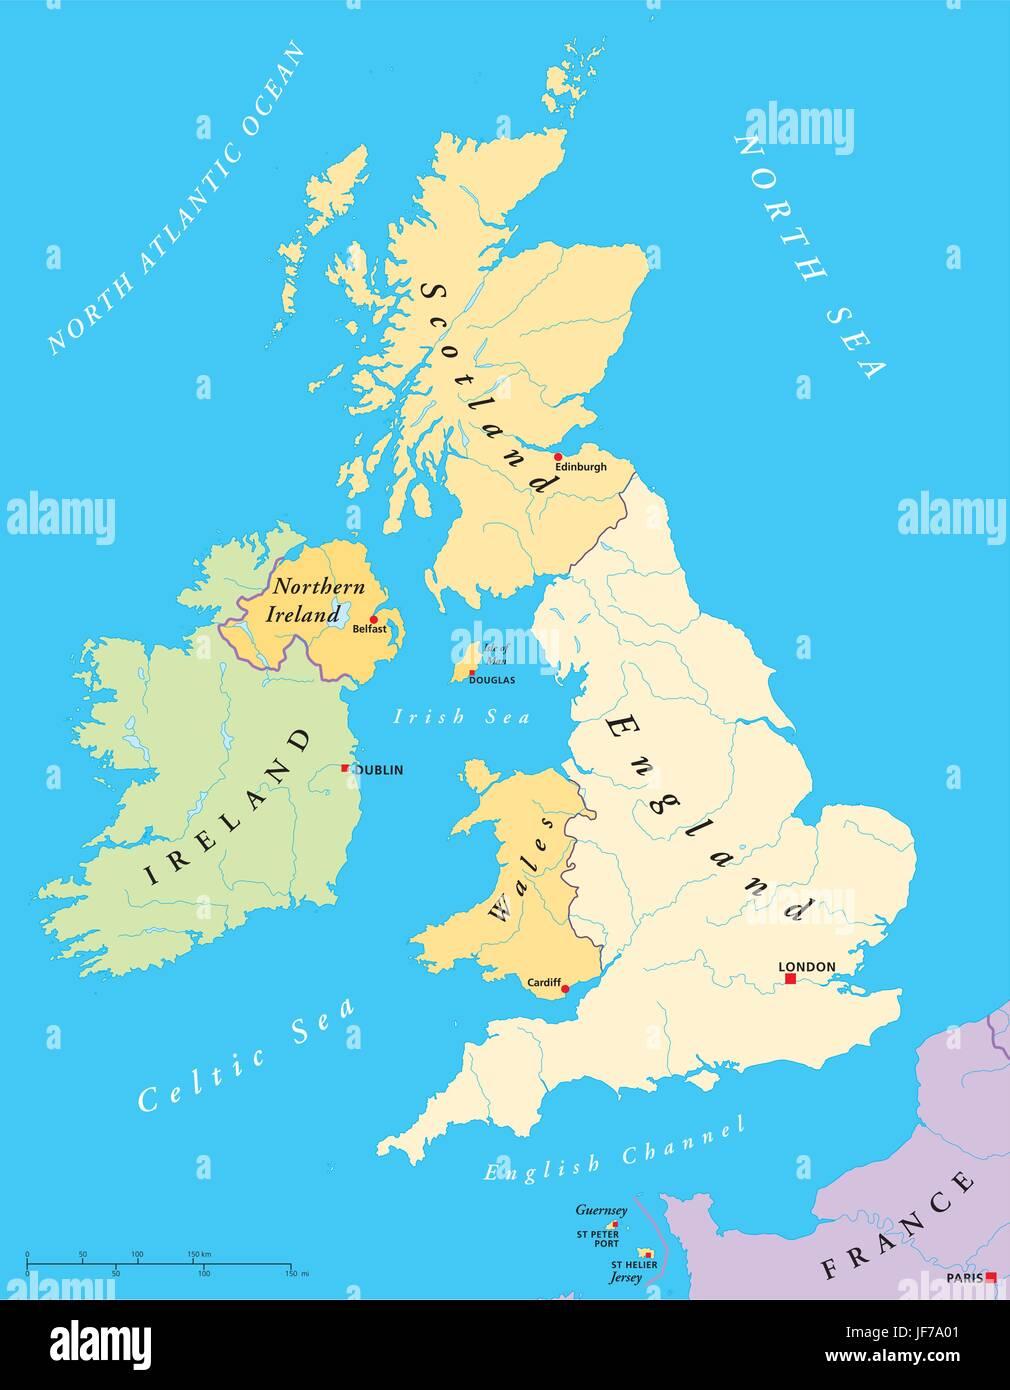 england weltkarte Inseln, Irland, British, England, Karte, Atlas, Weltkarte, Reisen  england weltkarte